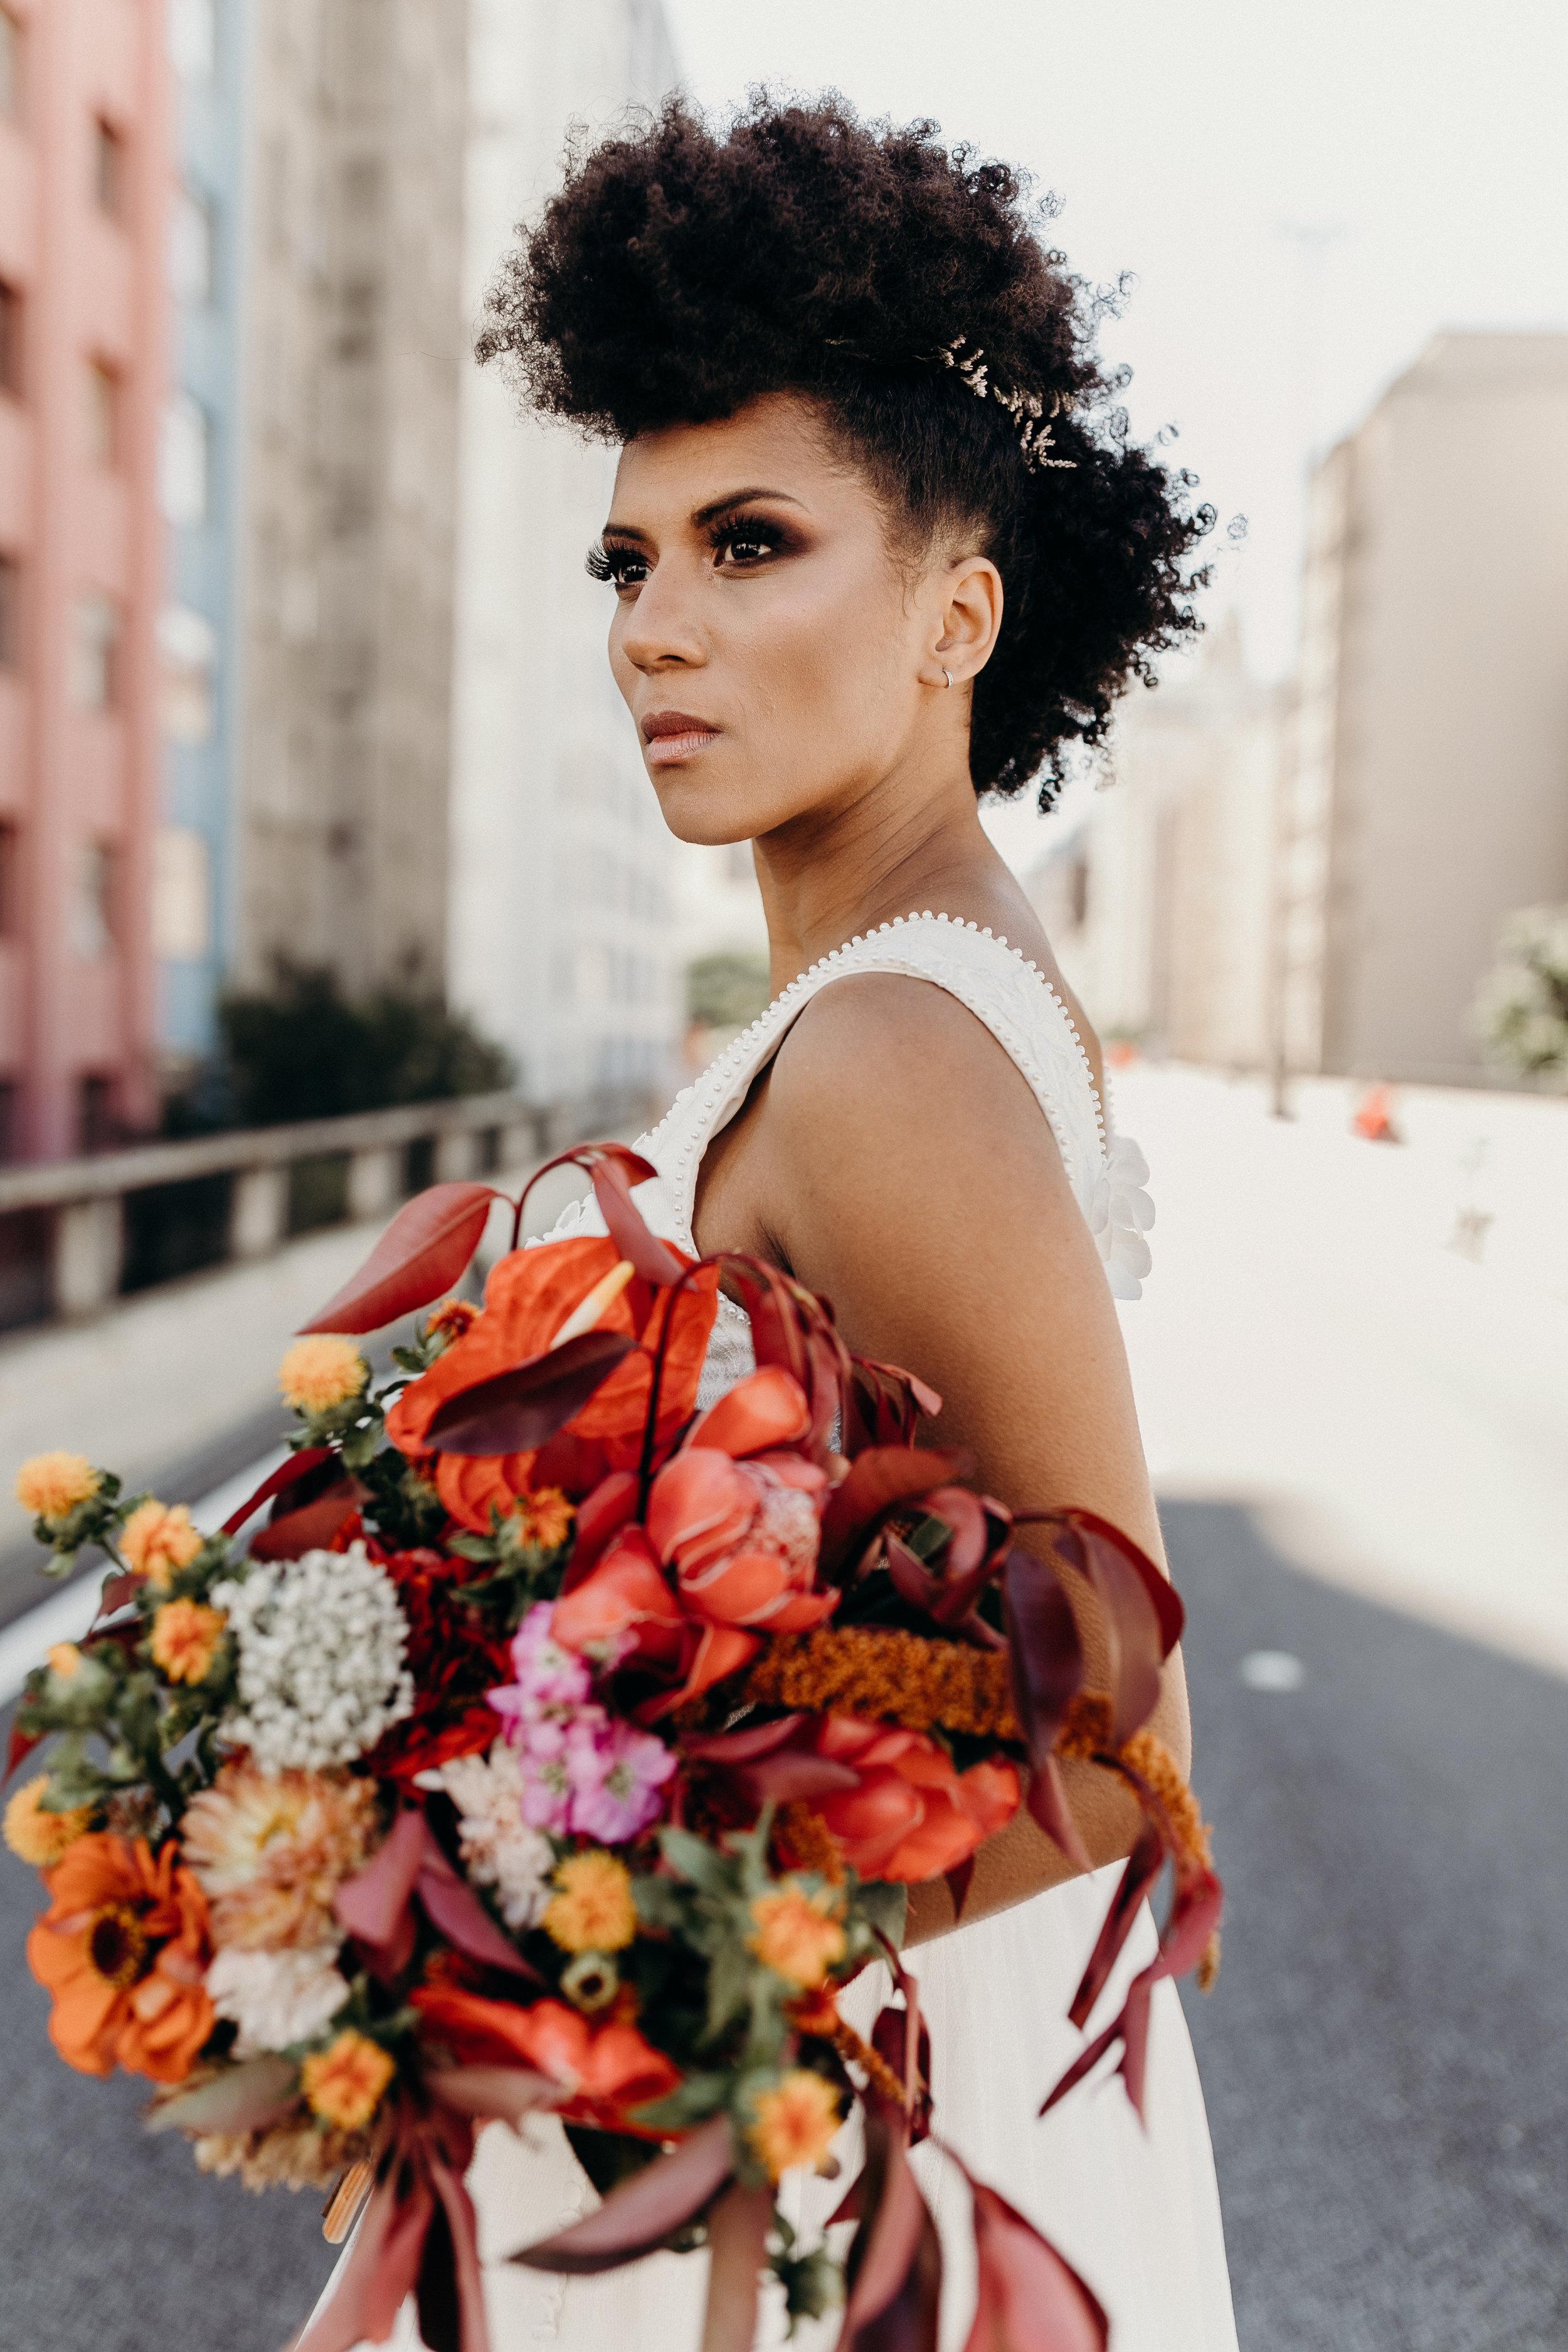 minhocao editorial - Victoria Bonvicini-182.jpg